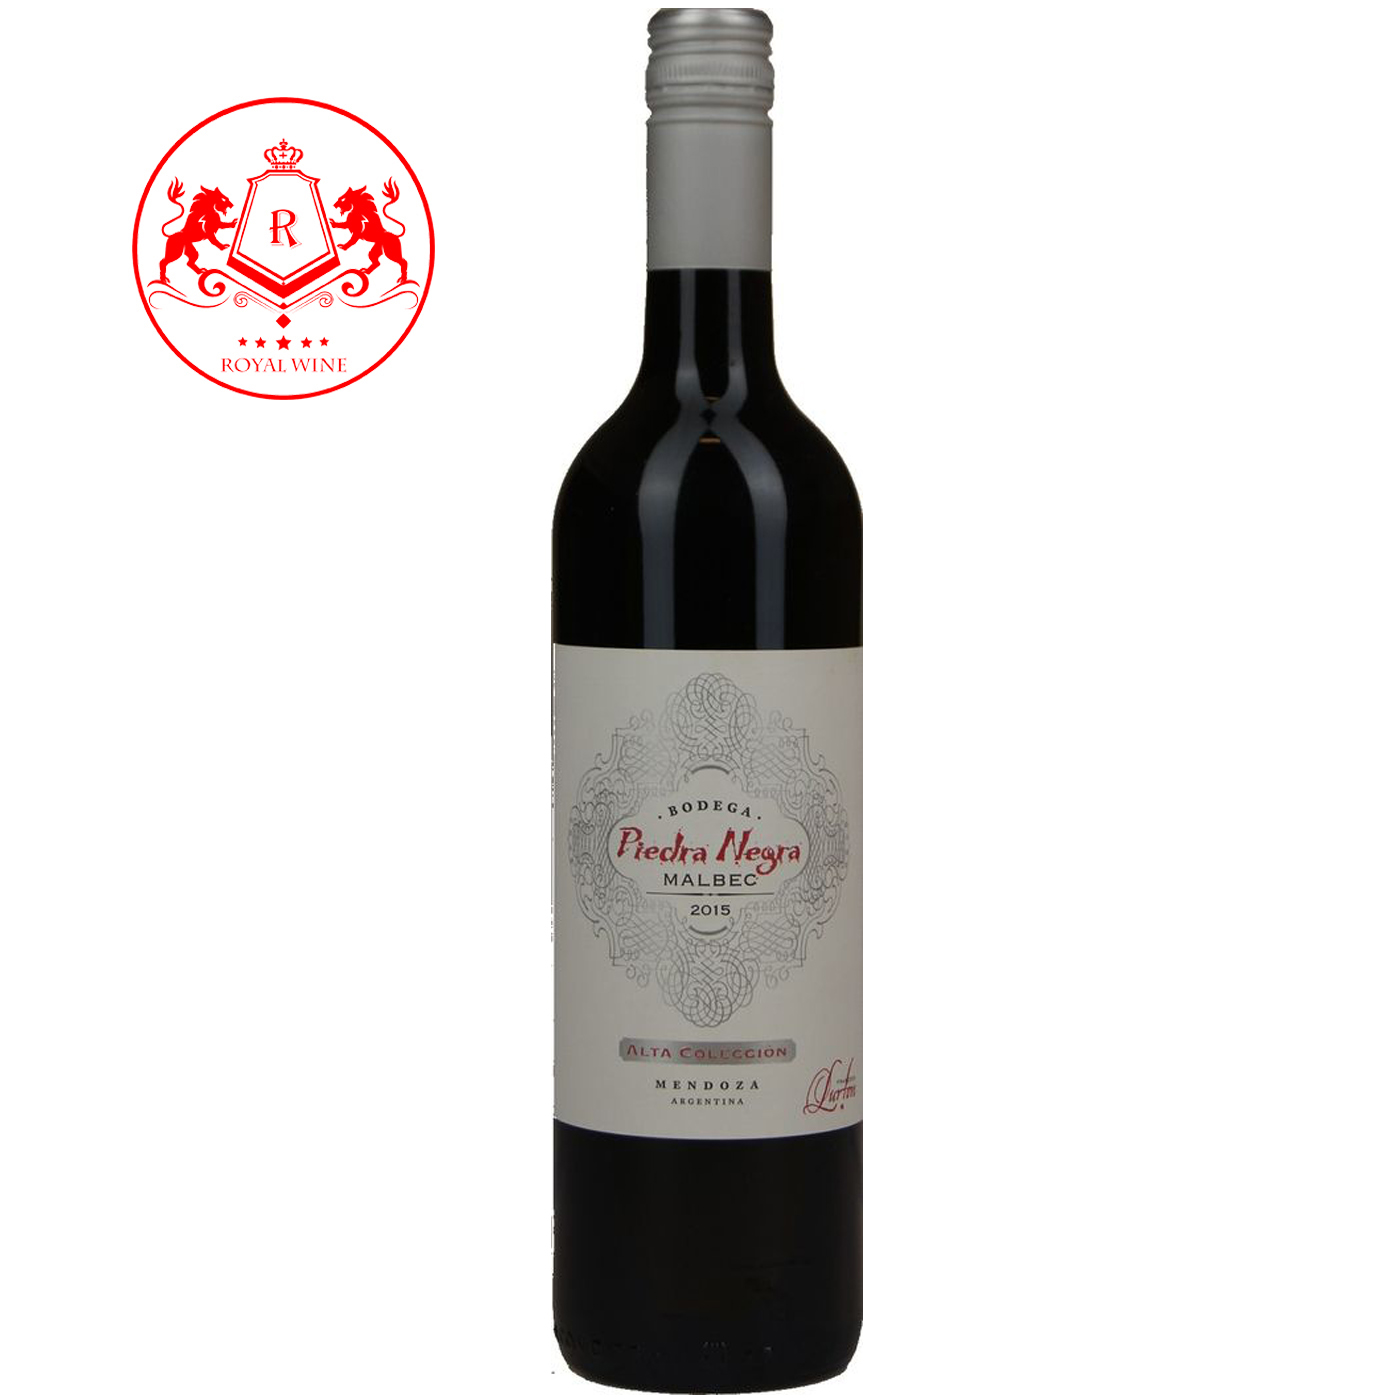 Rượu vang Bodega PIEDRA NEGRA Malbec